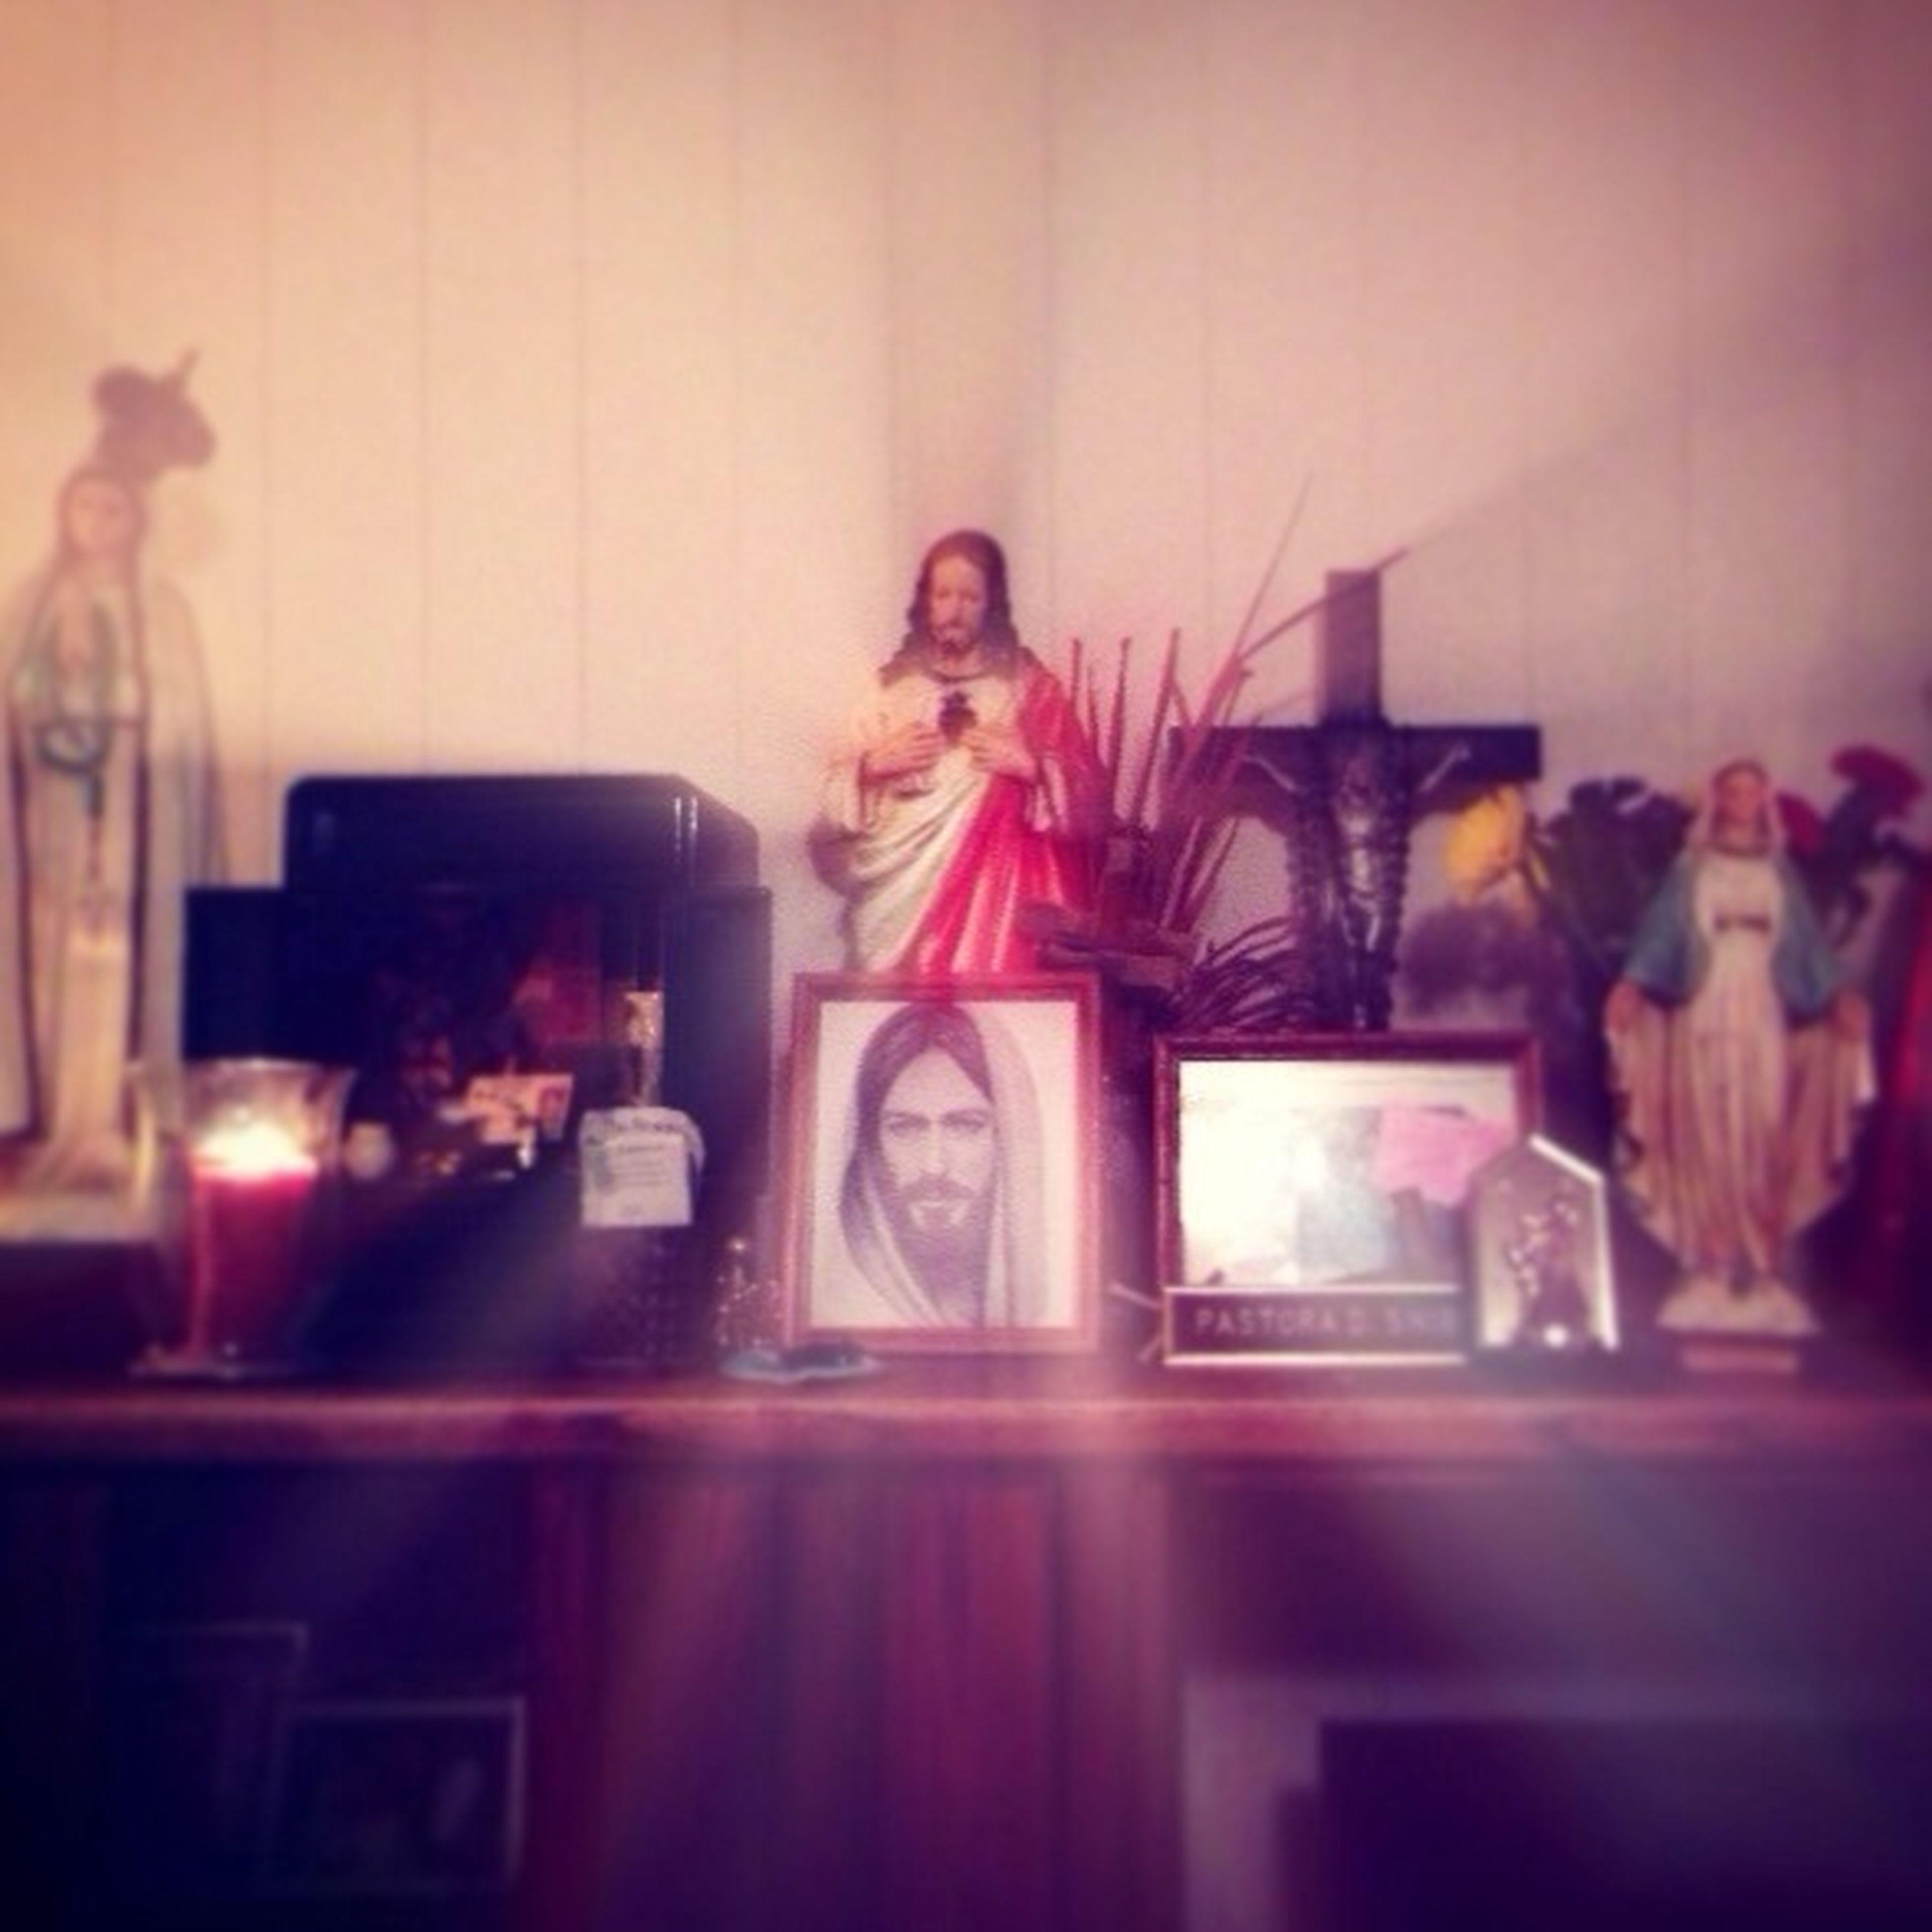 ROSARY time wit da Fam #Catholic #Tradition #MissingGrams